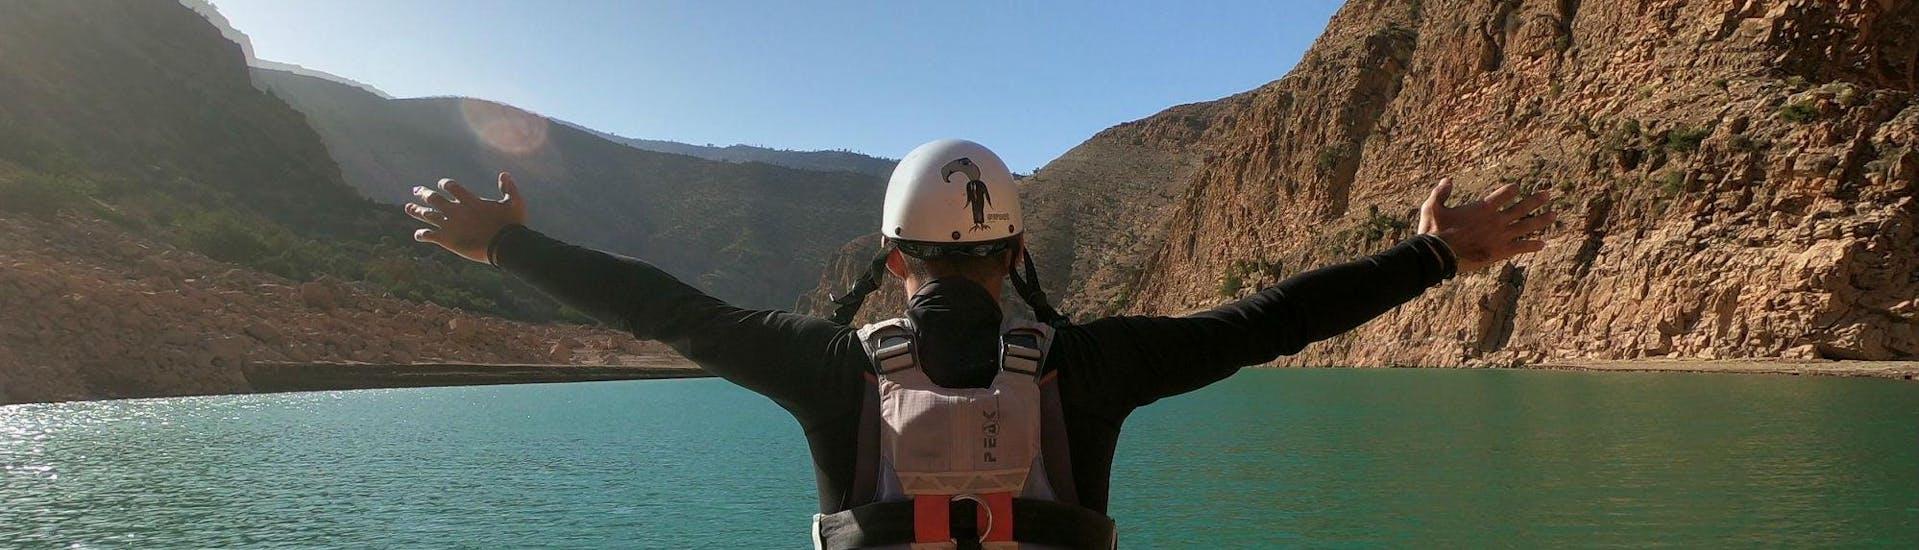 canyoning-advanced-tour---rio-verde-gualay-aventura-hero